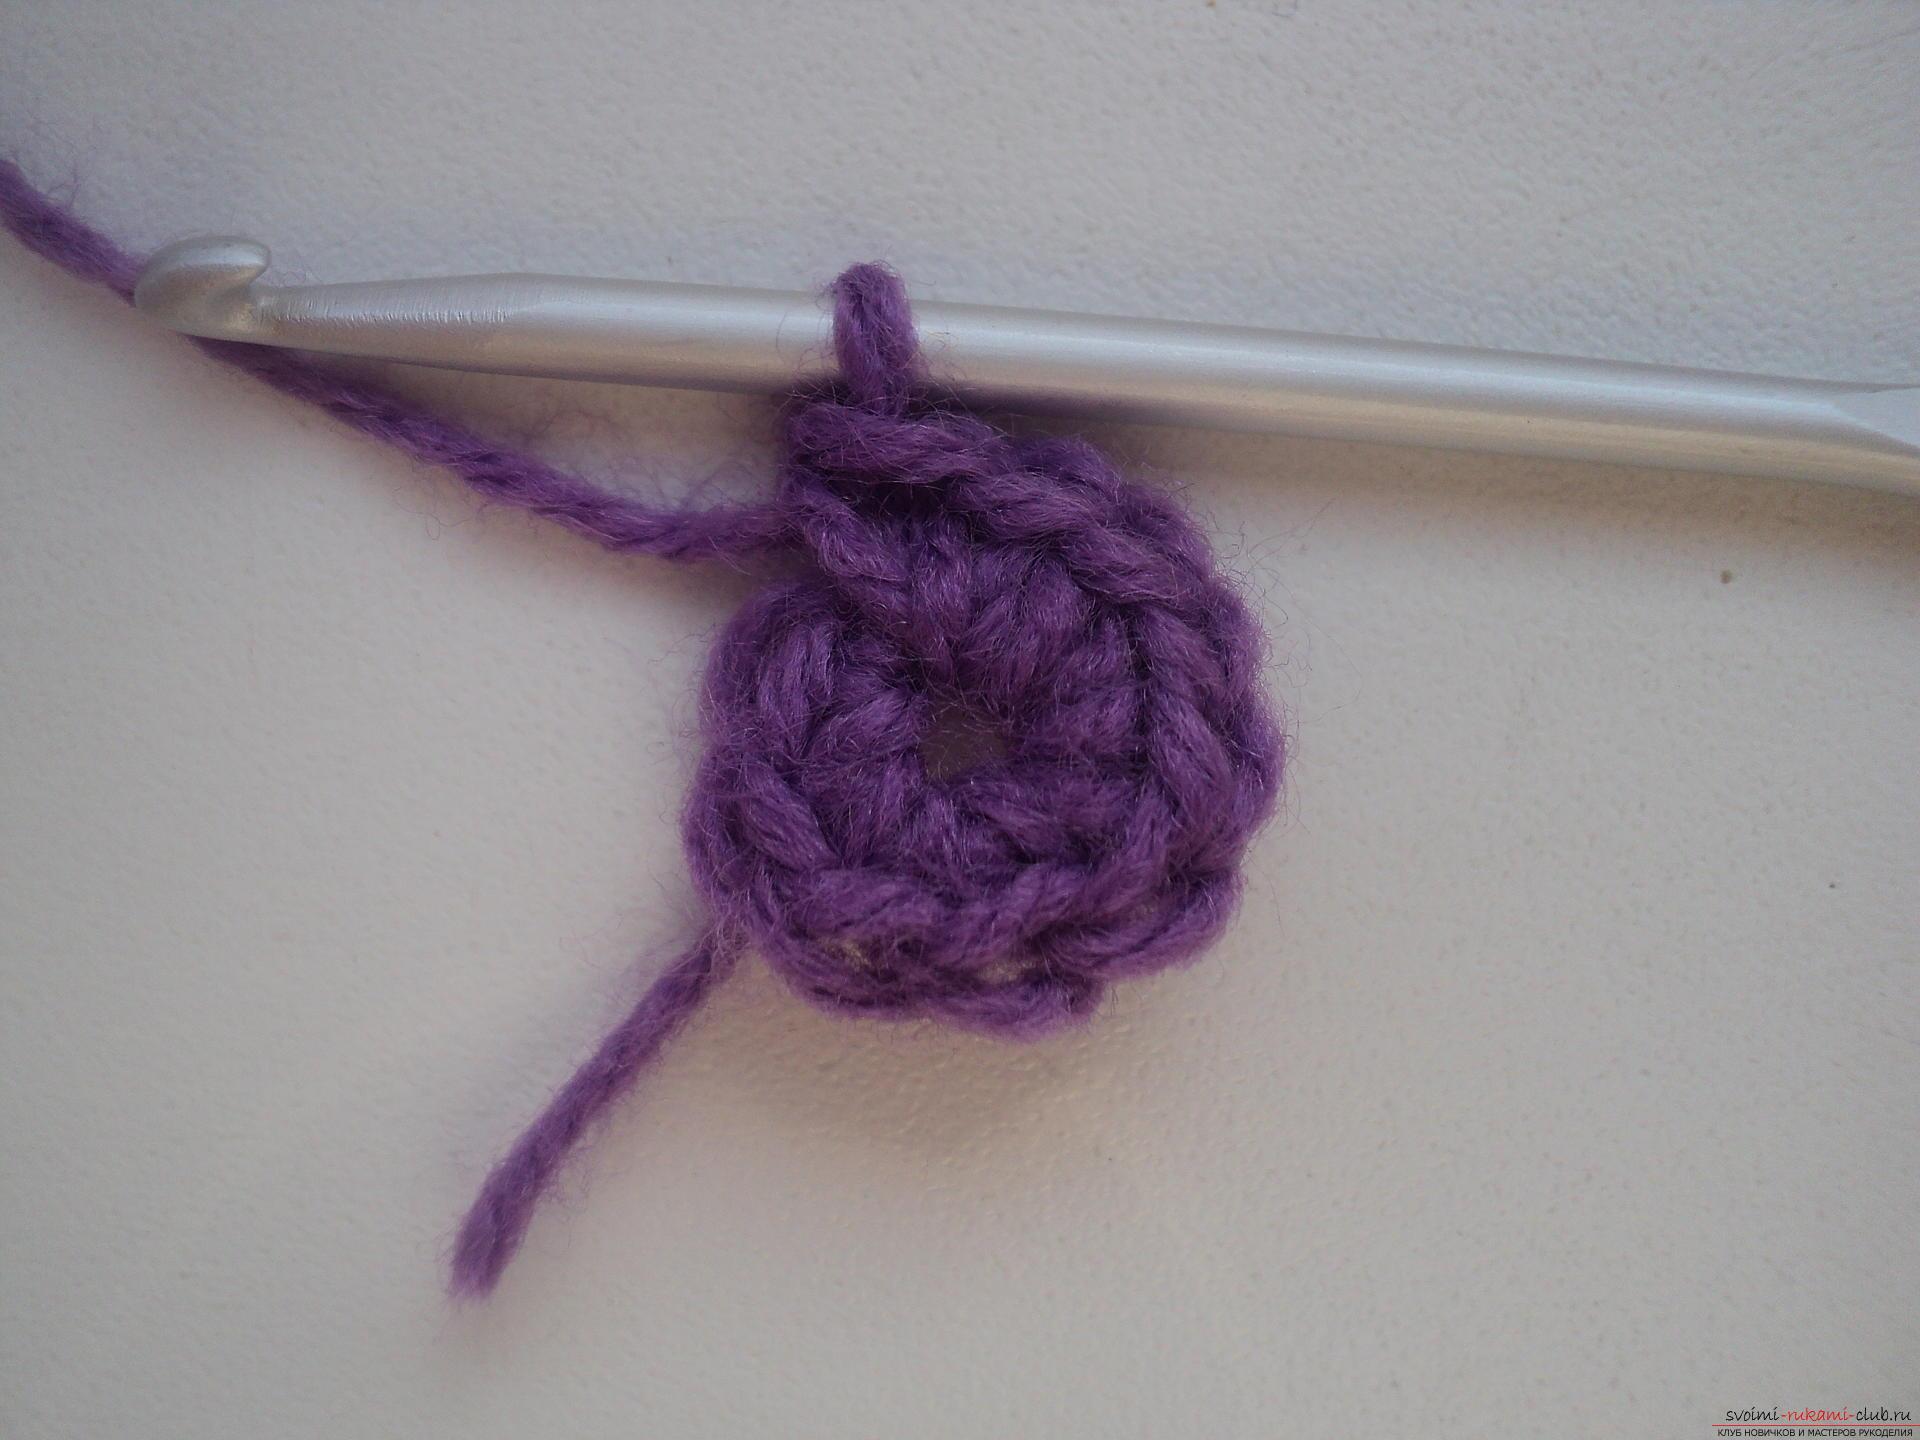 Вязание крючком цветов для повязок 708